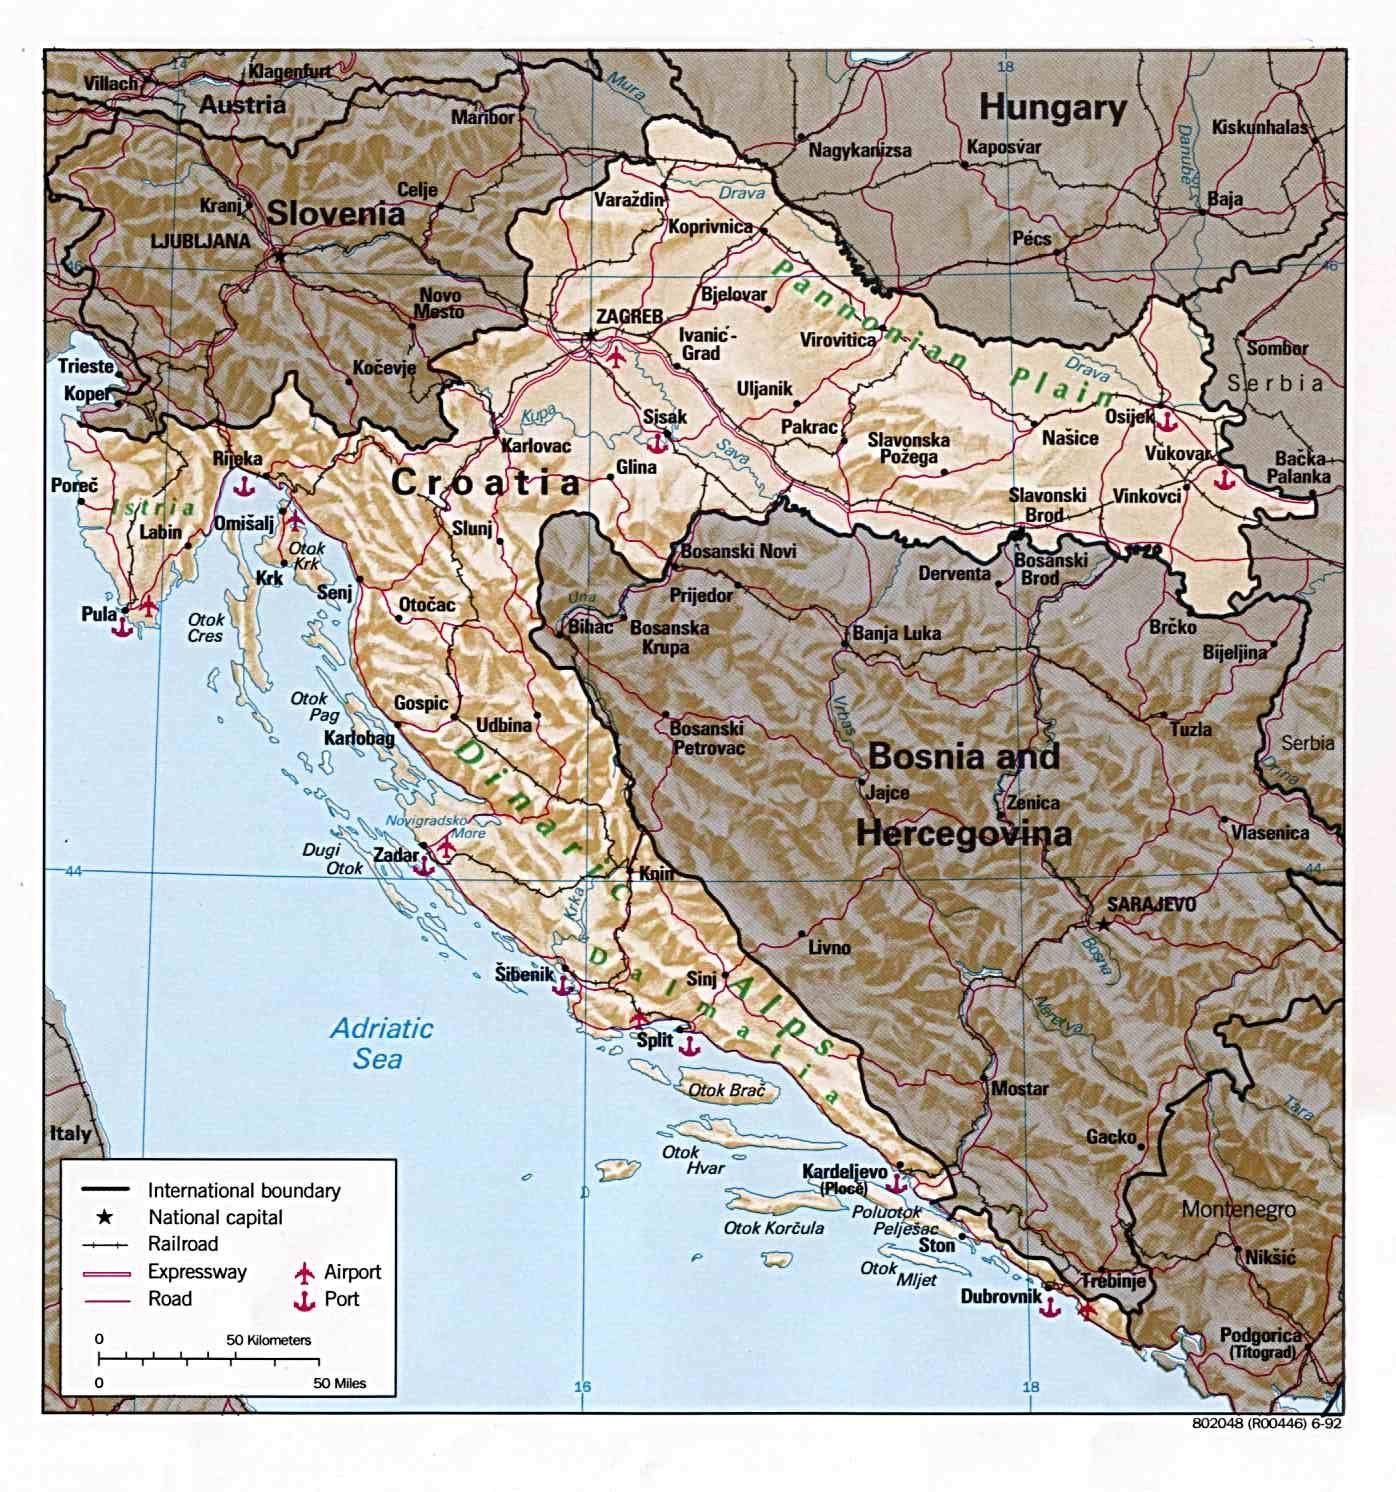 Croatia Http Www Travelbrochures Org 54 Europa Cruise To Croatia Croatia Map Travel Mistakes Croatia